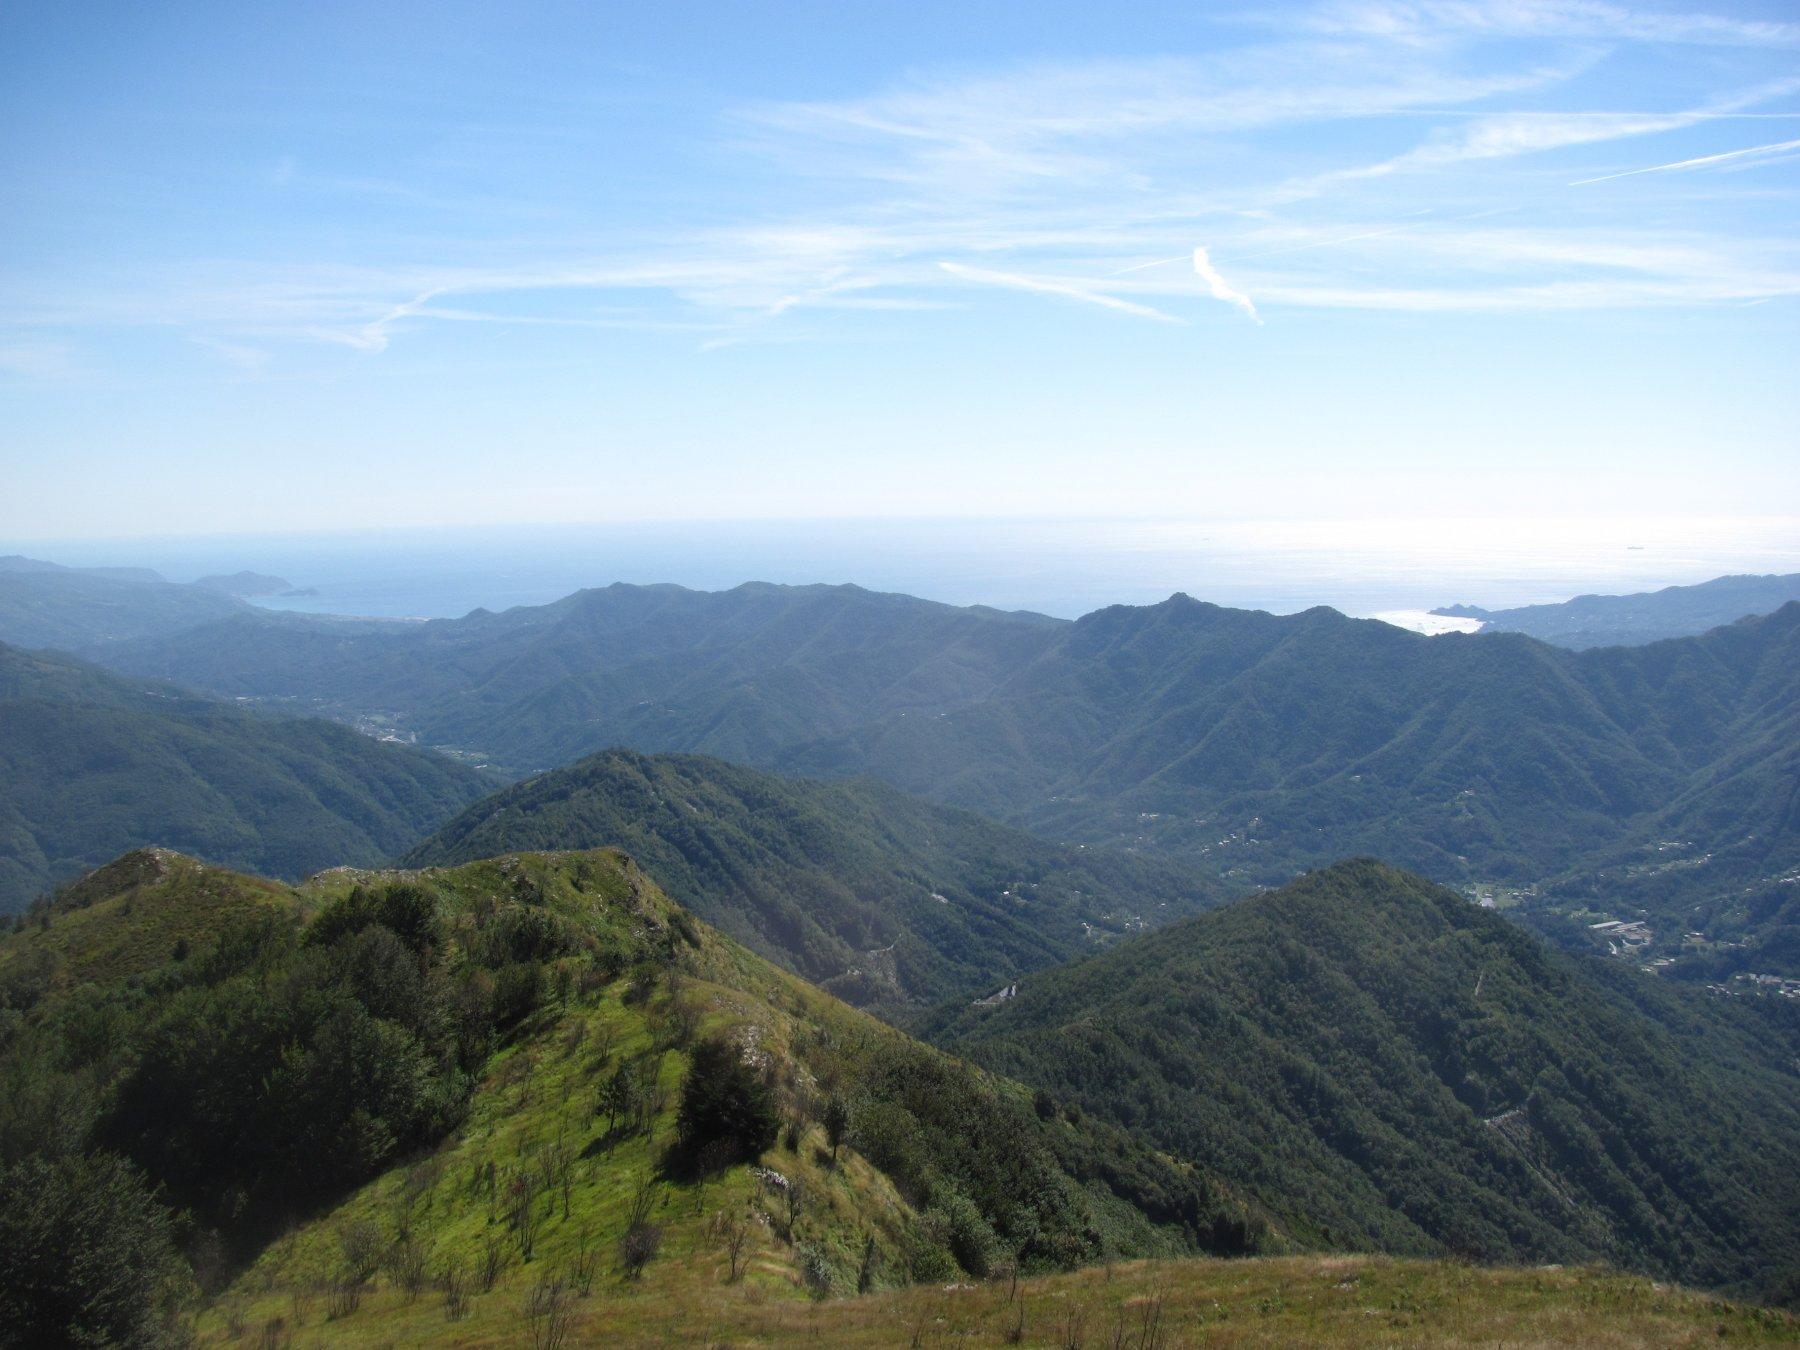 panorama da P.ta Manara a Portofino